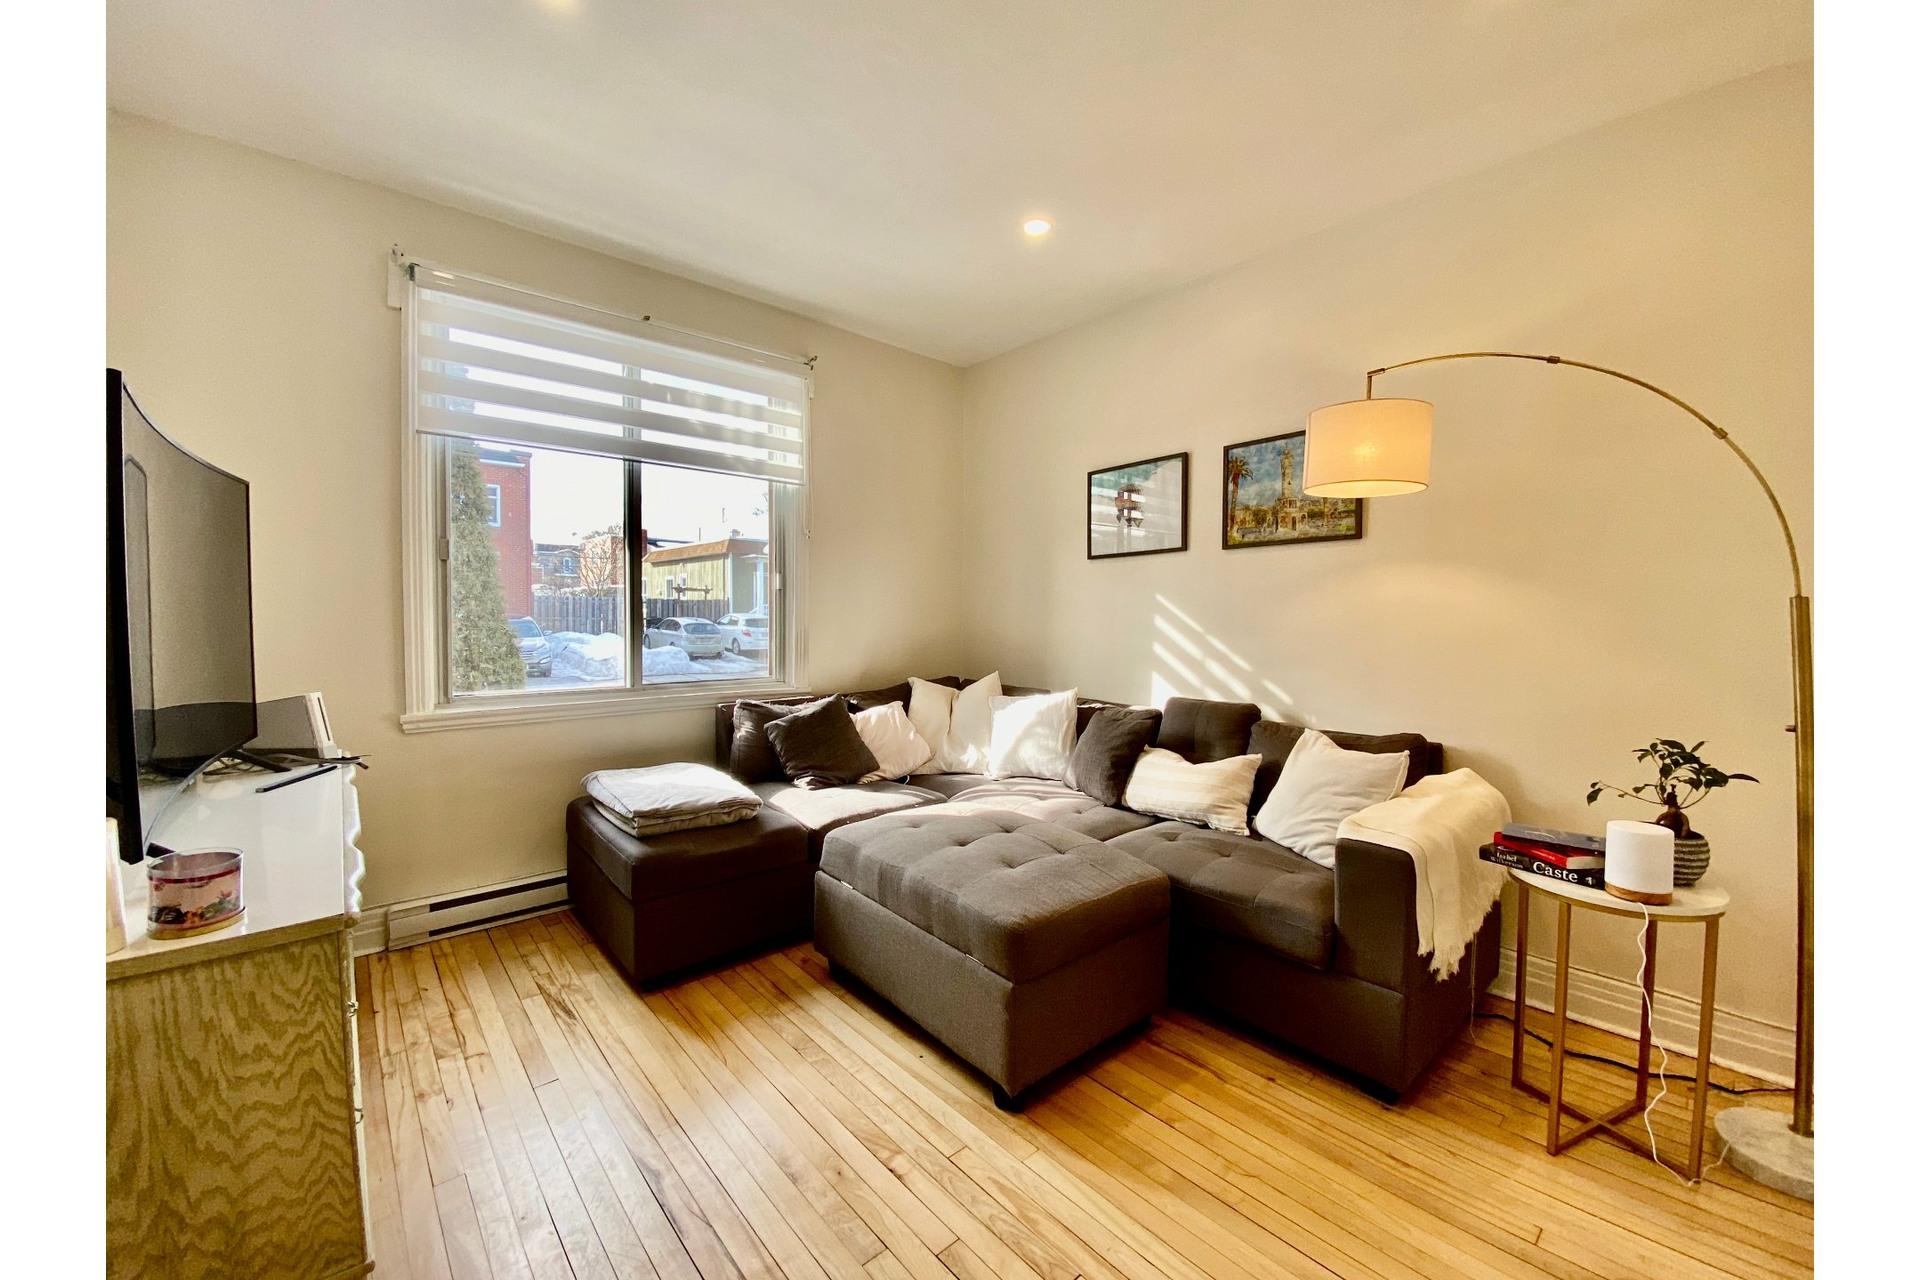 image 3 - Duplex En venta Lachine Montréal  - 6 habitaciones